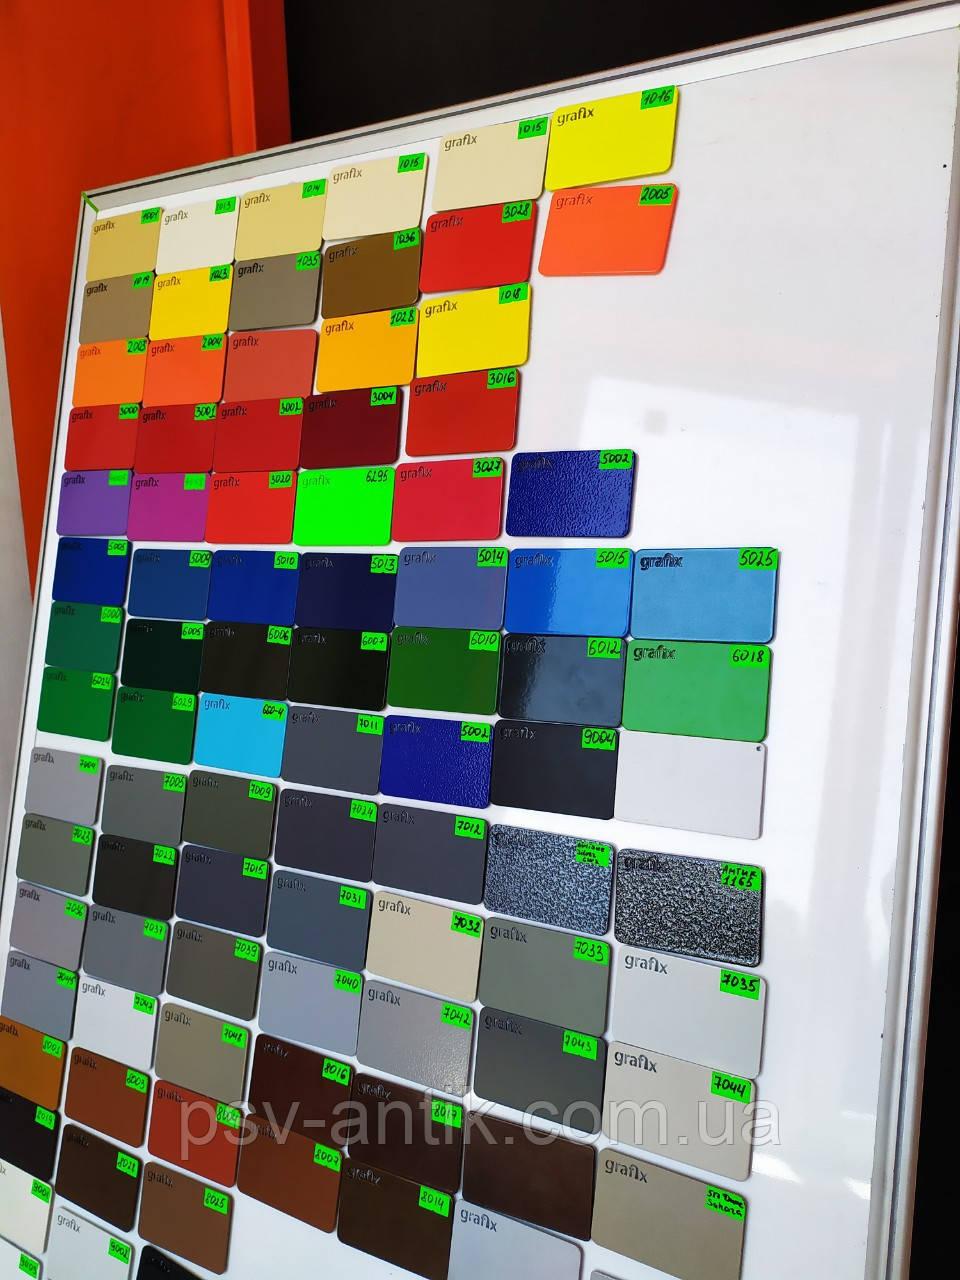 Порошковая краска глянцевая, полиэфирная, архитектурная, 5012